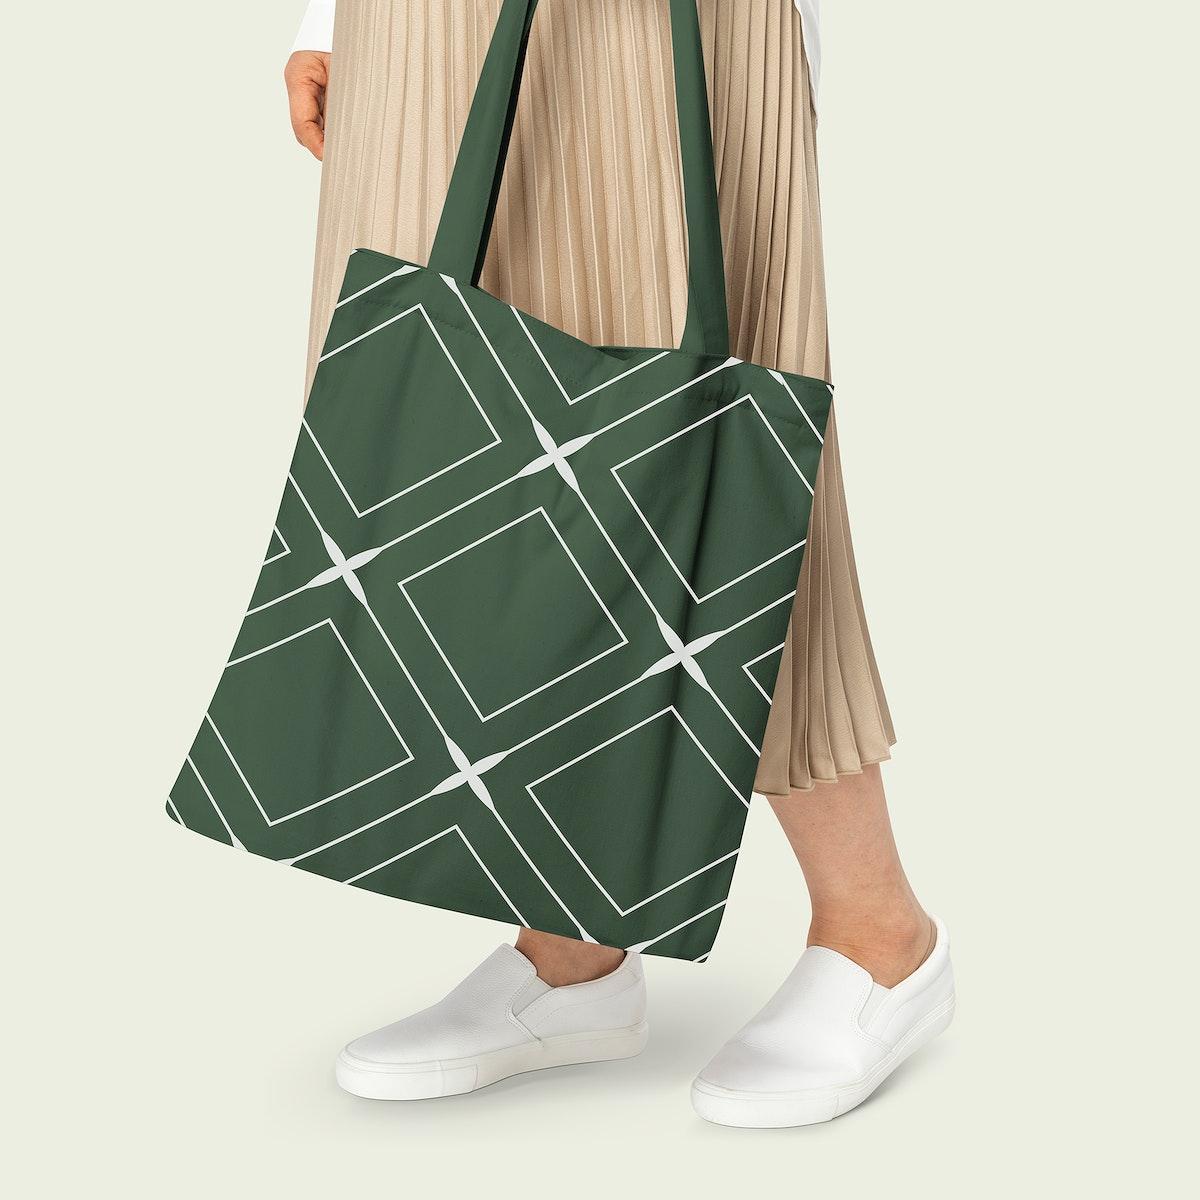 Green tote bag with rhombus pattern basic apparel shoot